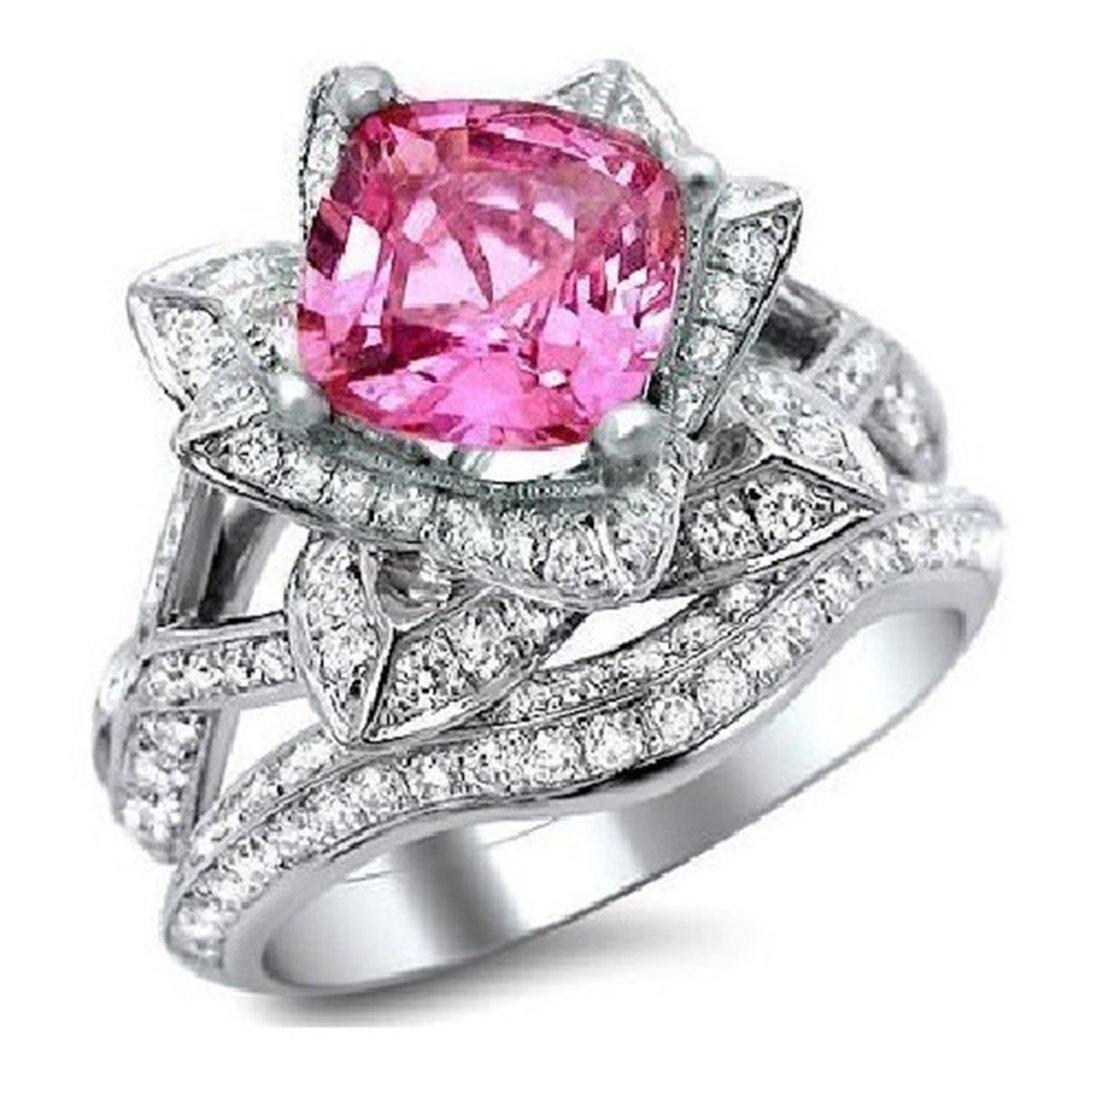 Smjewels 2.75Ct Cushion Cut Sapphire Lotus Flower CZ Diamond Ring Bridal Set 14K White Gold Fn